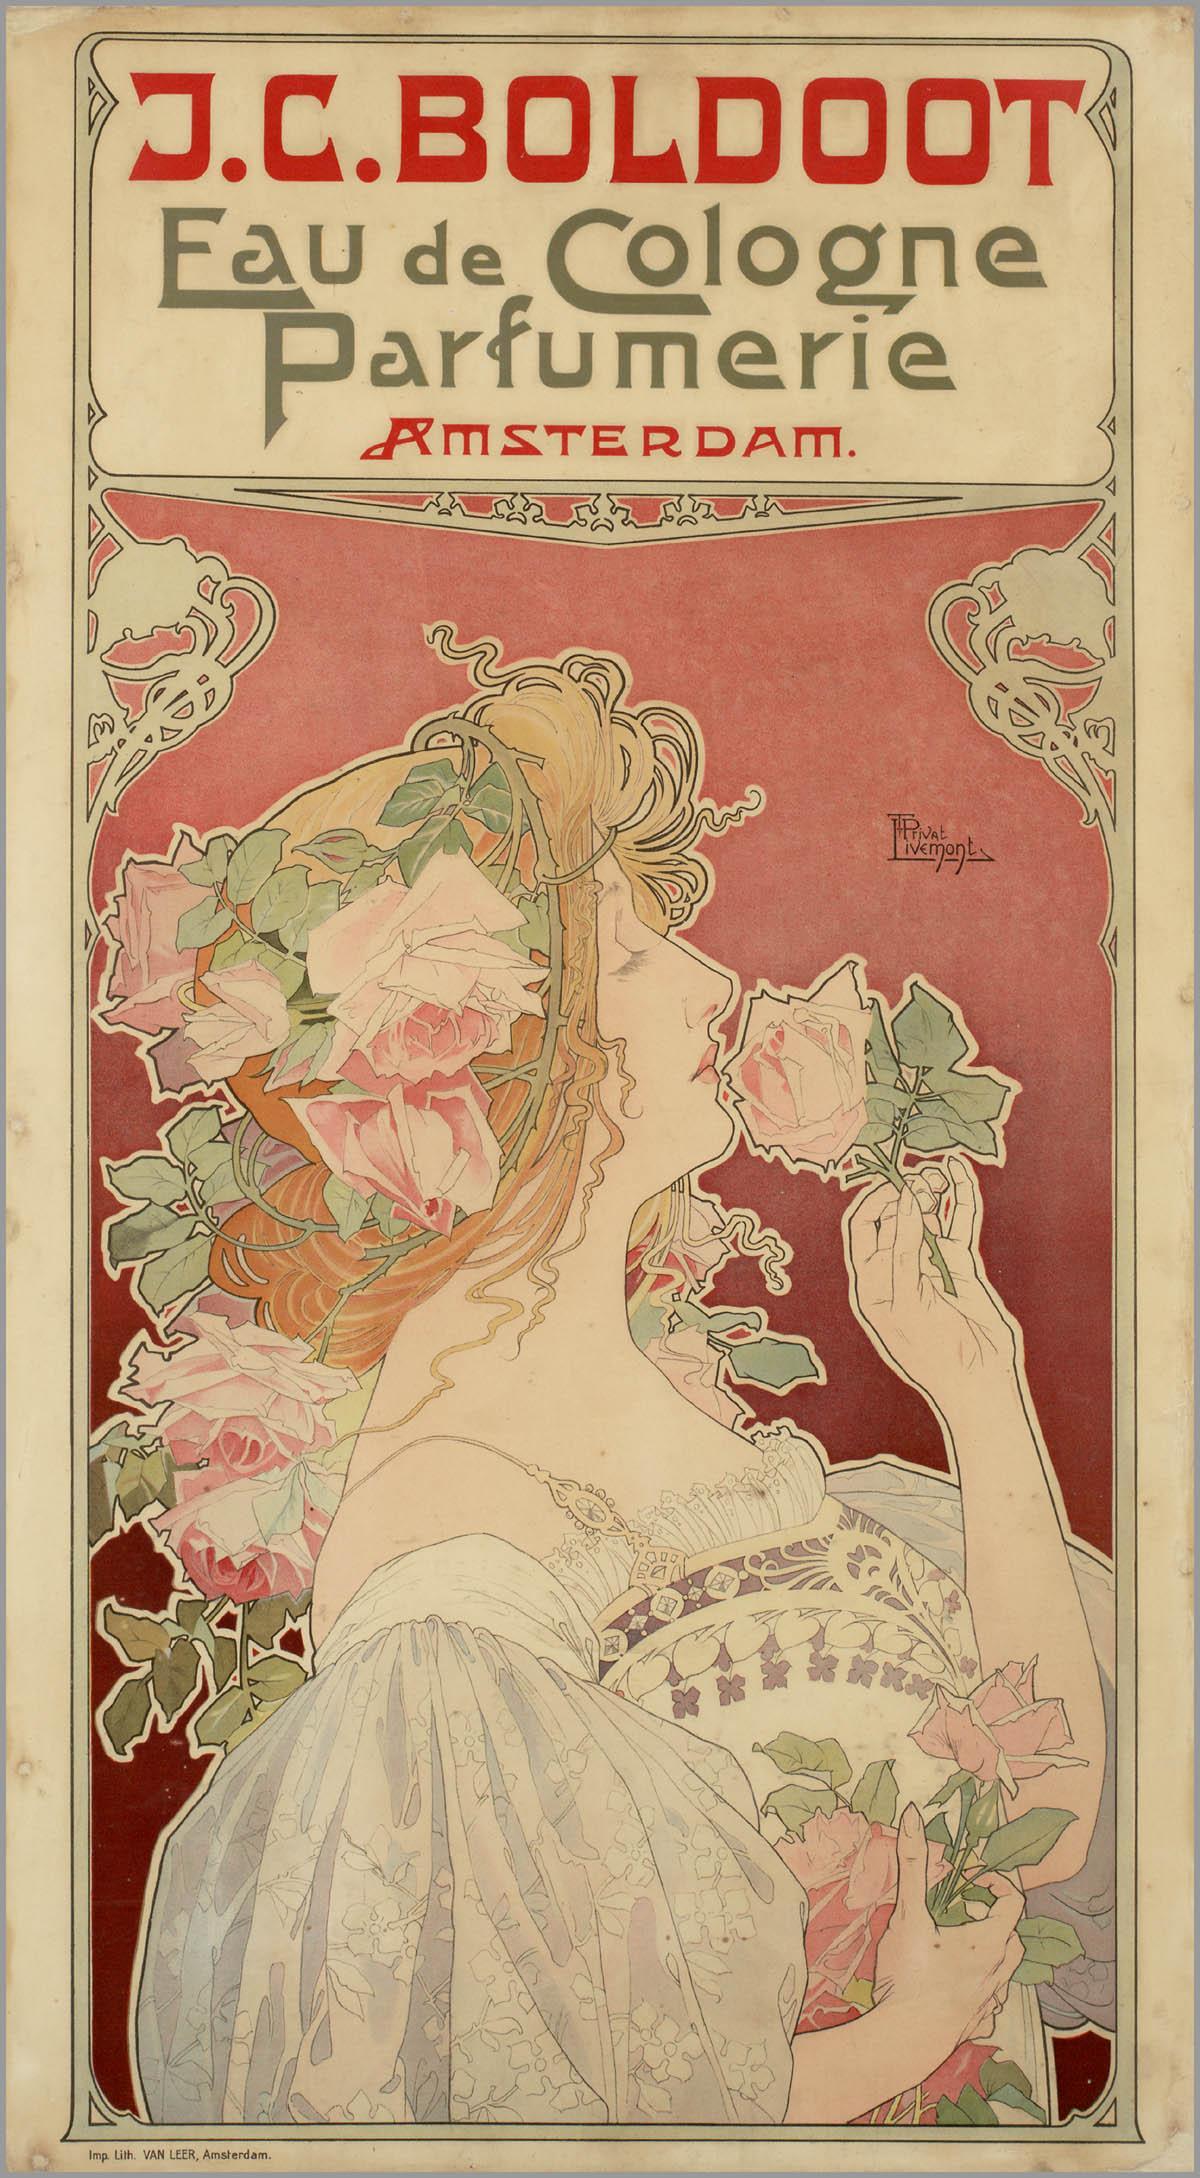 Calendar Art Wikipedia : File privat livemont boldoot g wikimedia commons